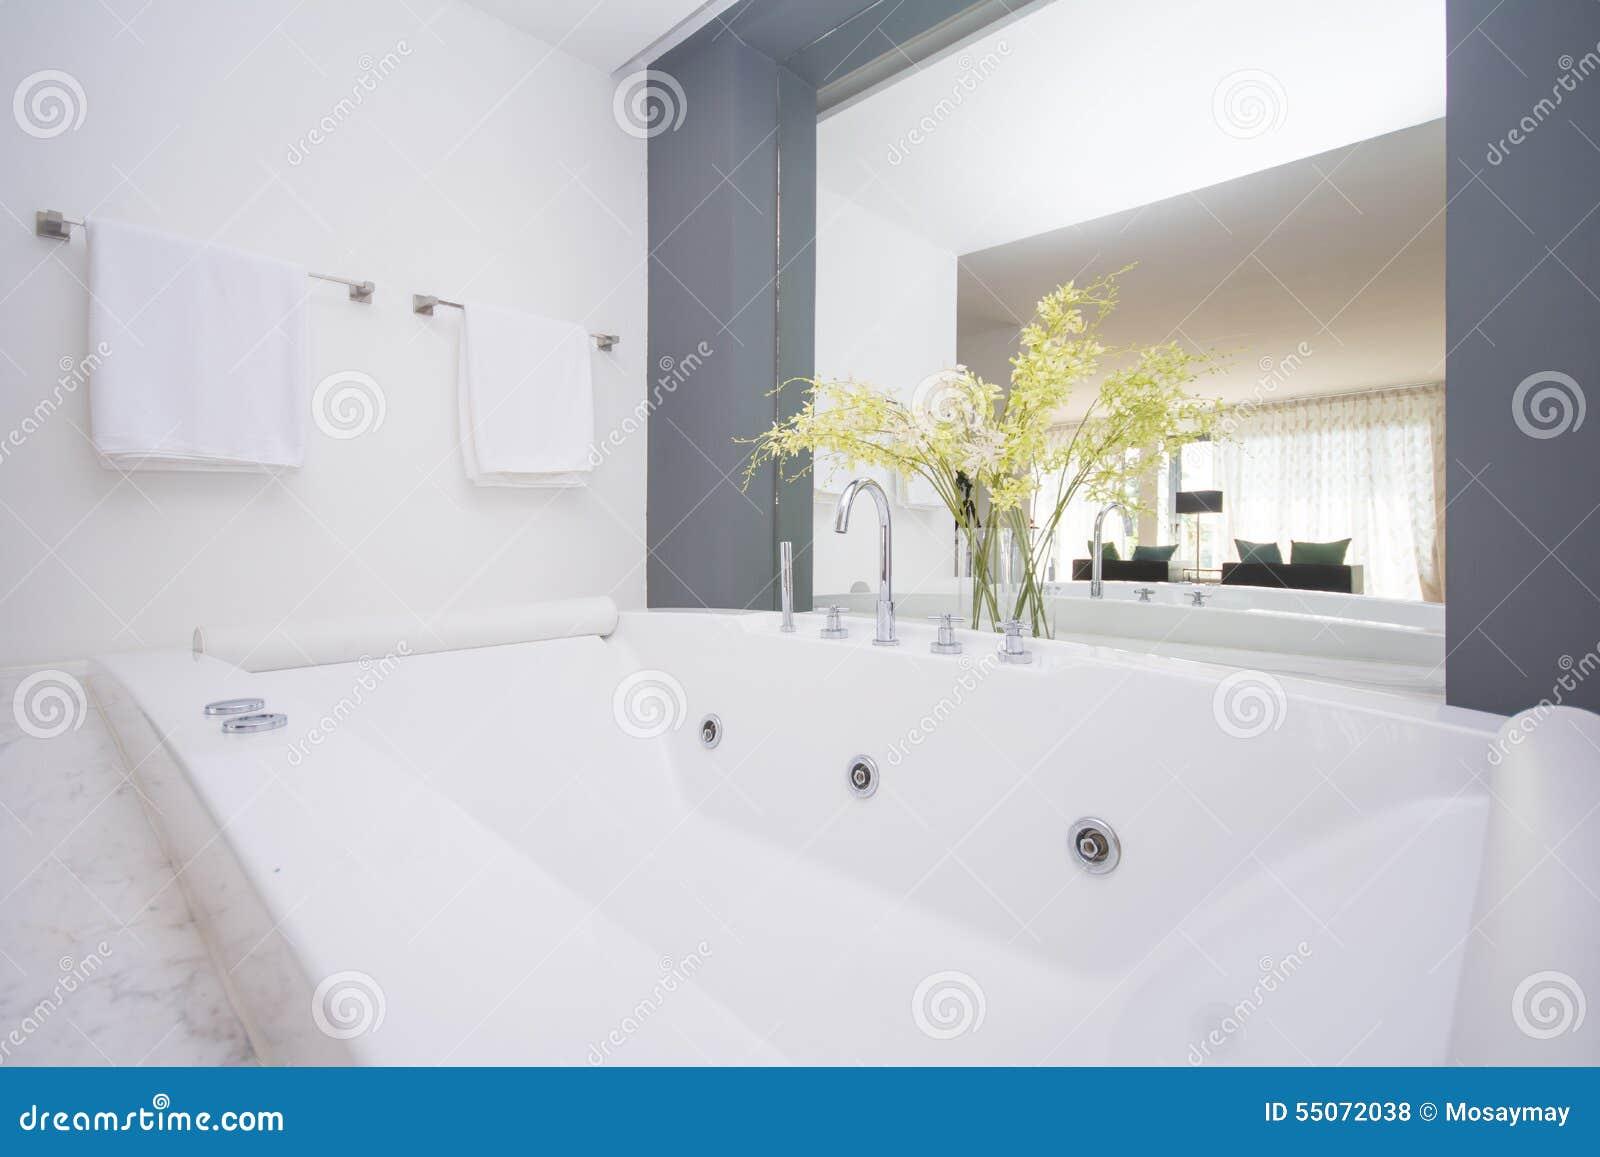 Stort lyxigt badkar i badrum arkivfoto   bild: 55072038